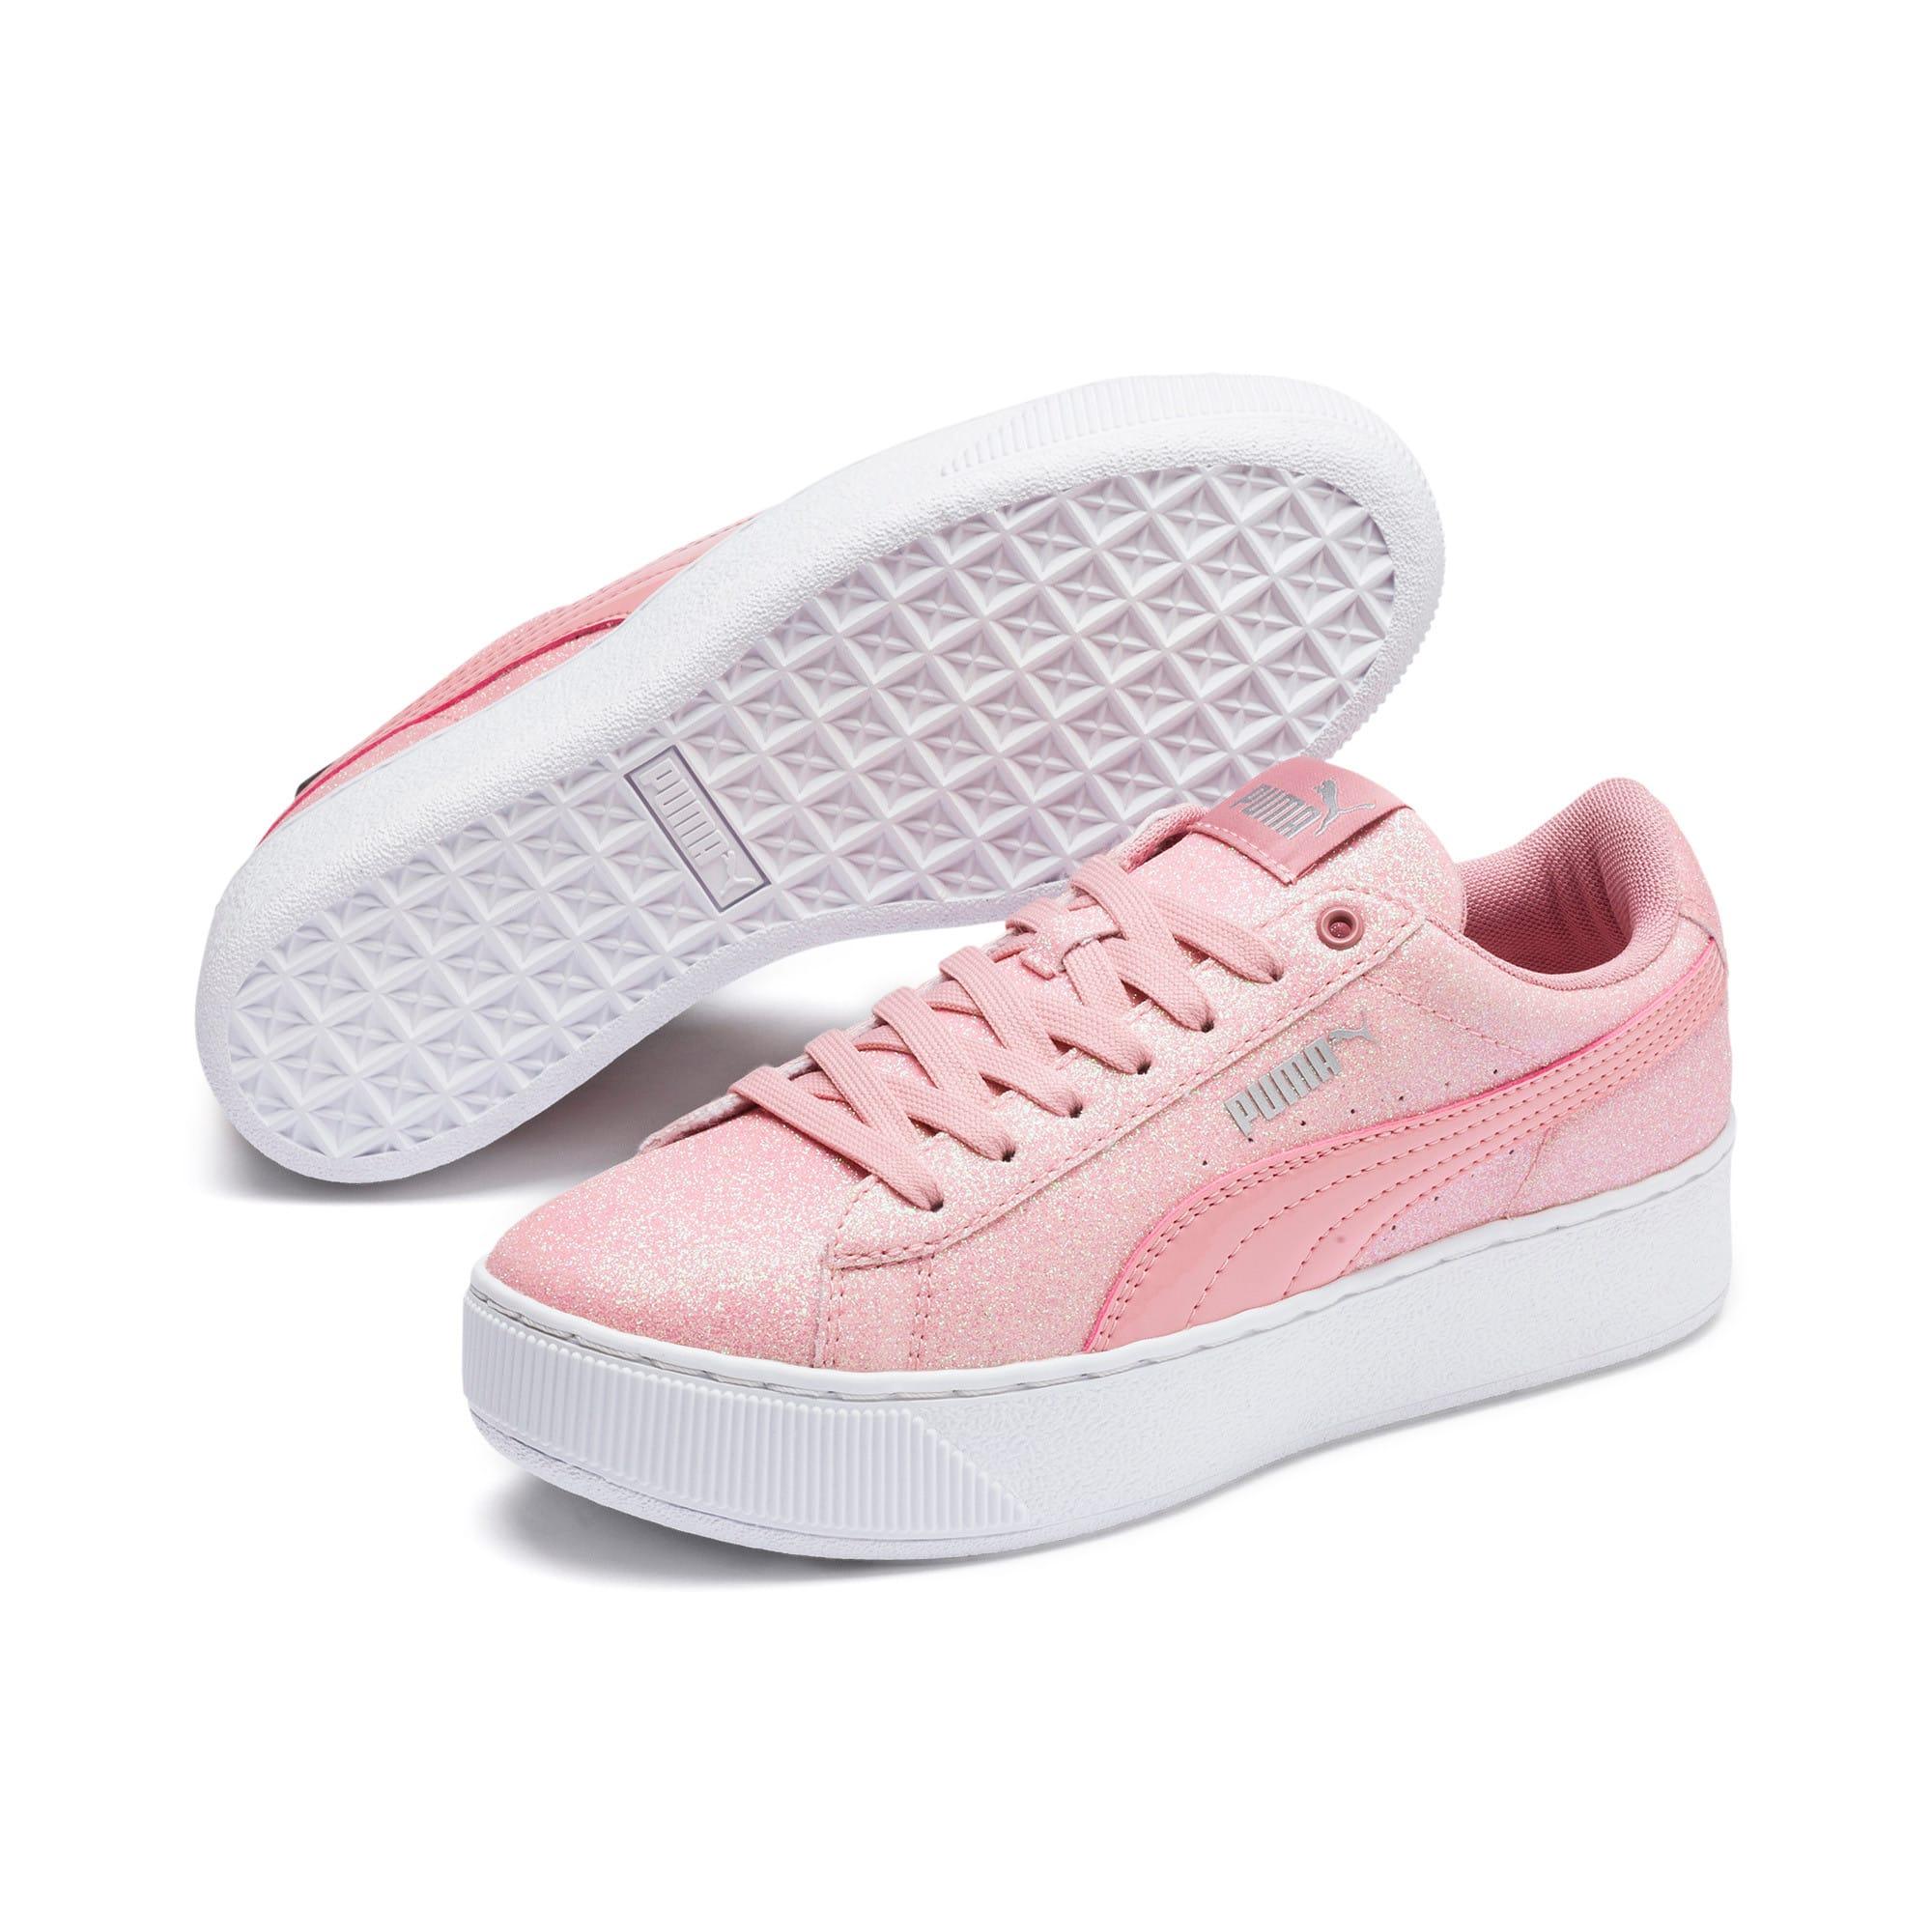 Thumbnail 2 of PUMA Vikky Platform Glitz Sneakers JR, Bridal Rose-Bridal Rose, medium